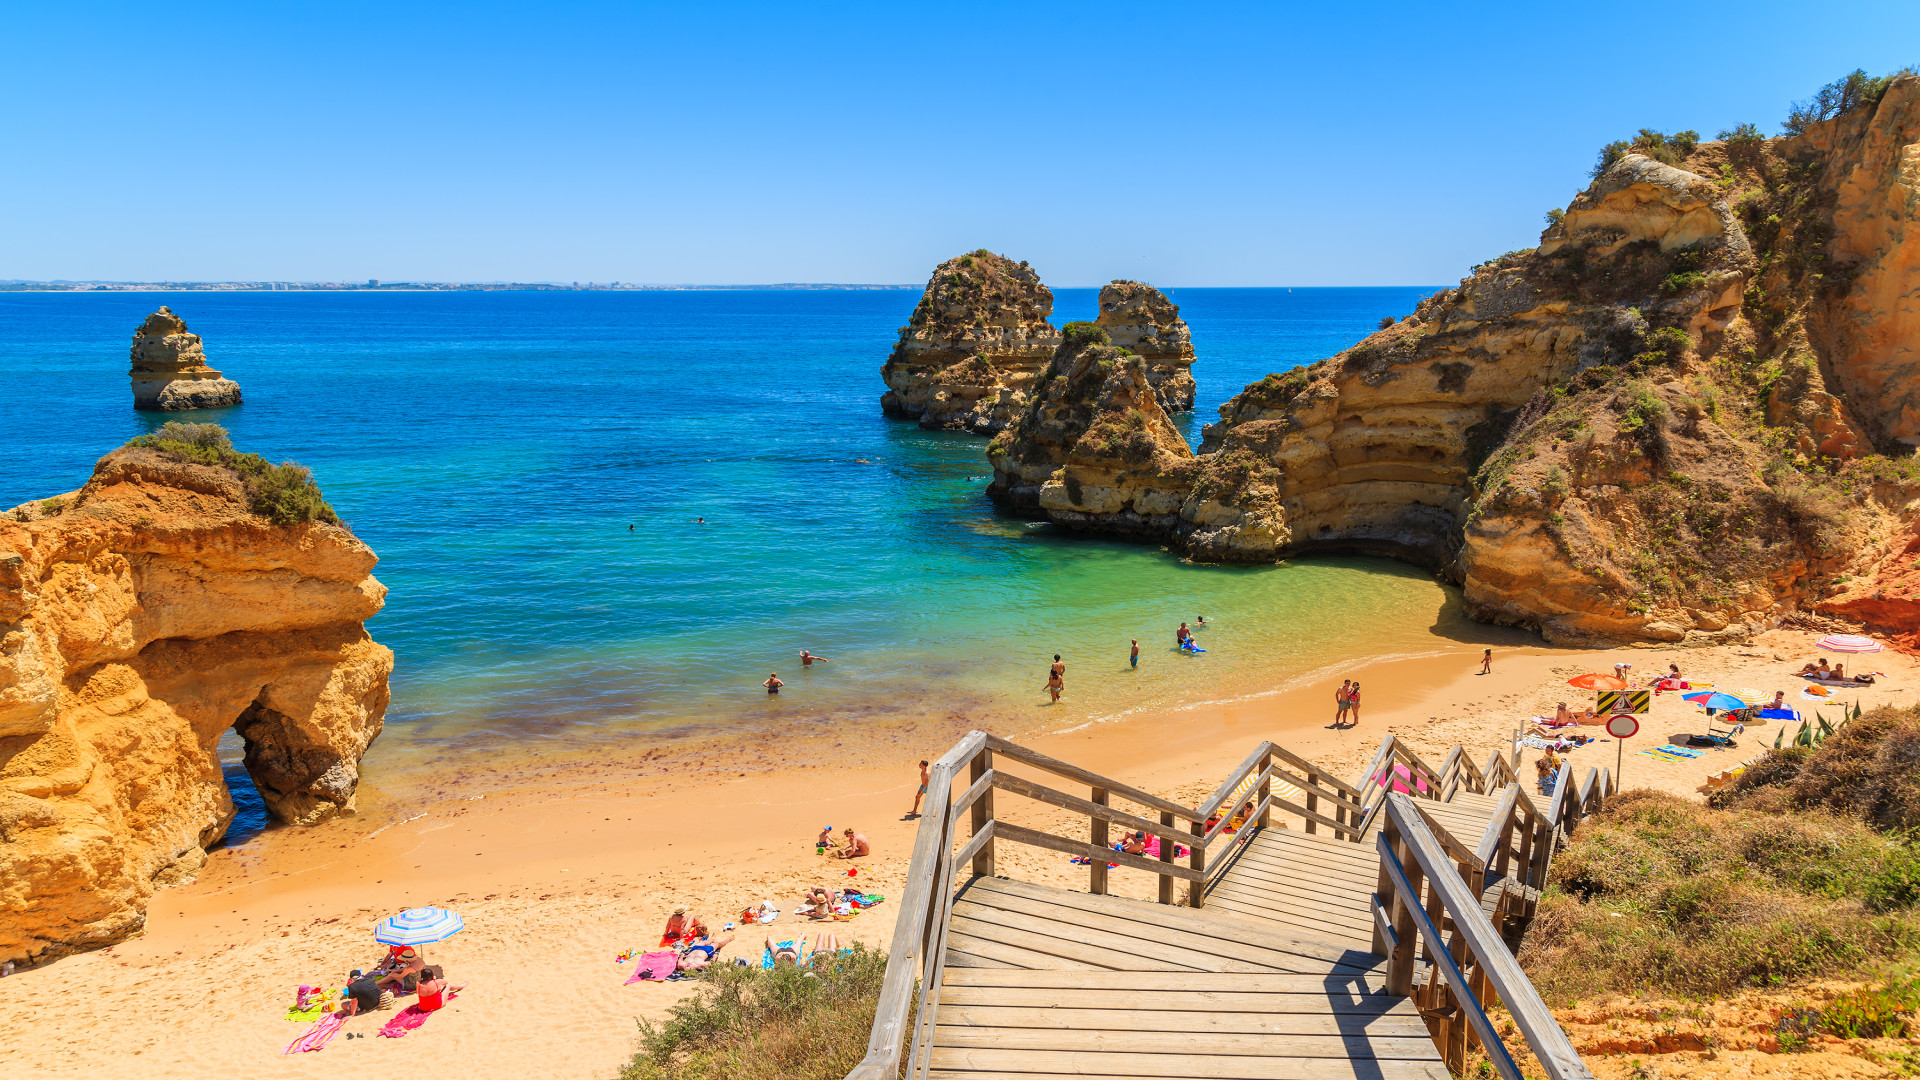 Houten voetbrug naar strand, Praia do Camilo, Algarve, Portugal